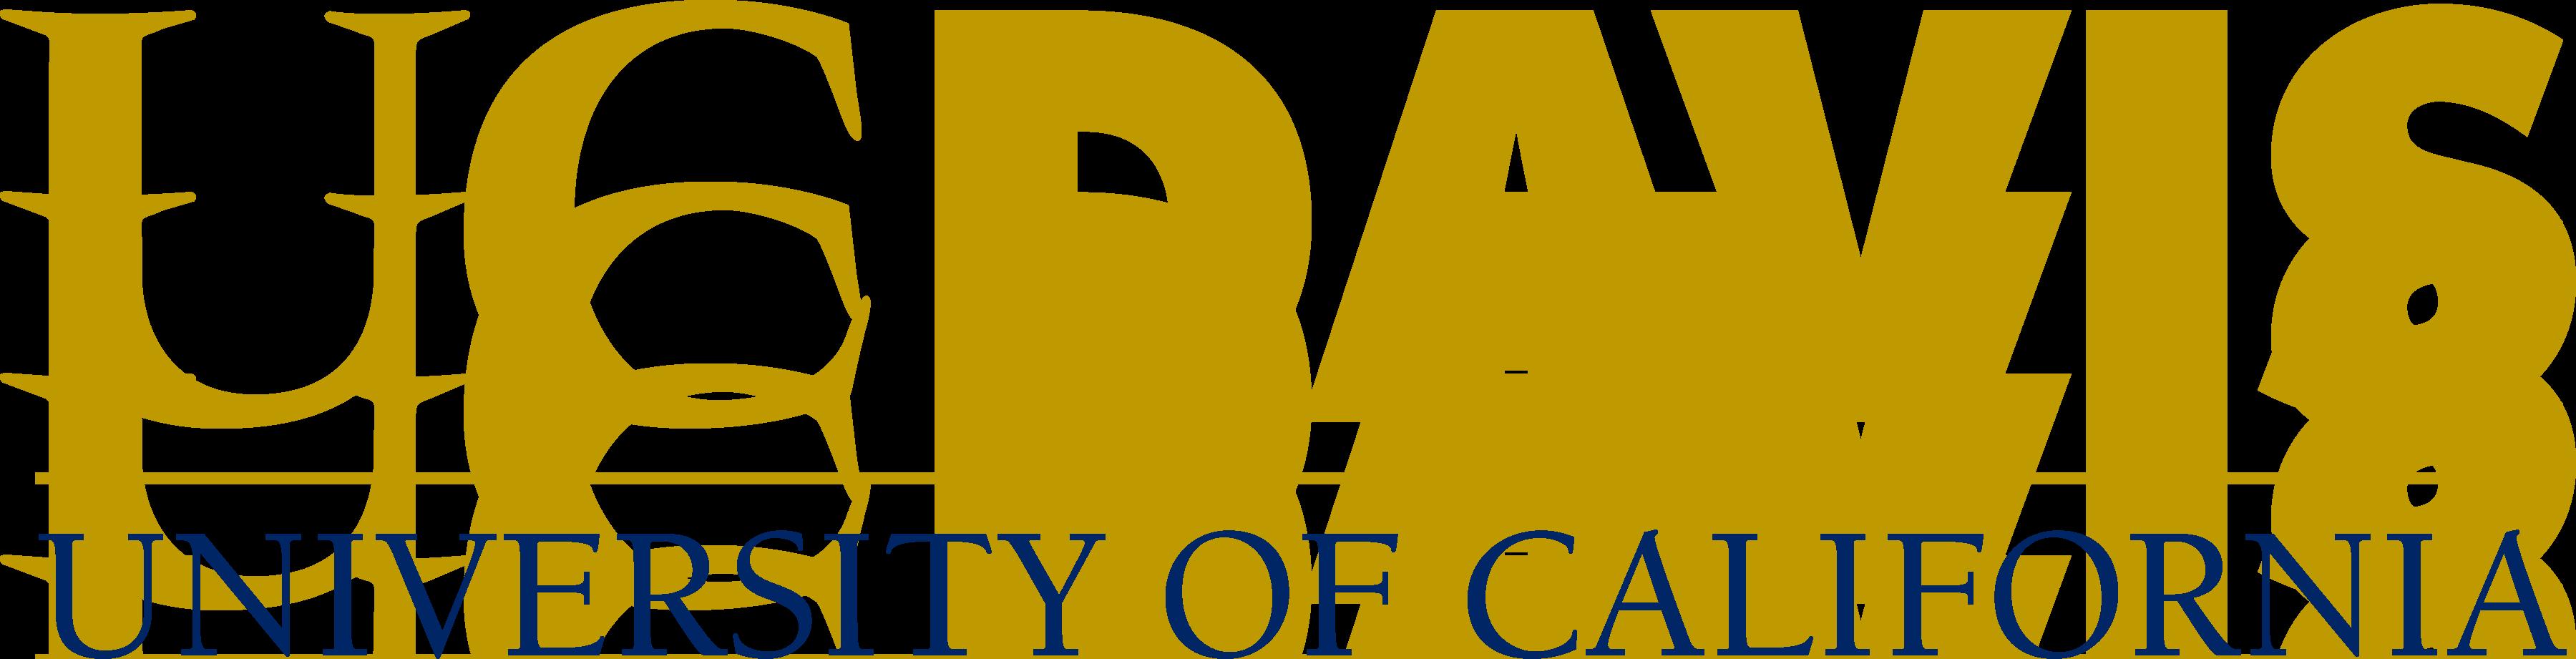 Uc Davis Logo Download The Hive Mind a...